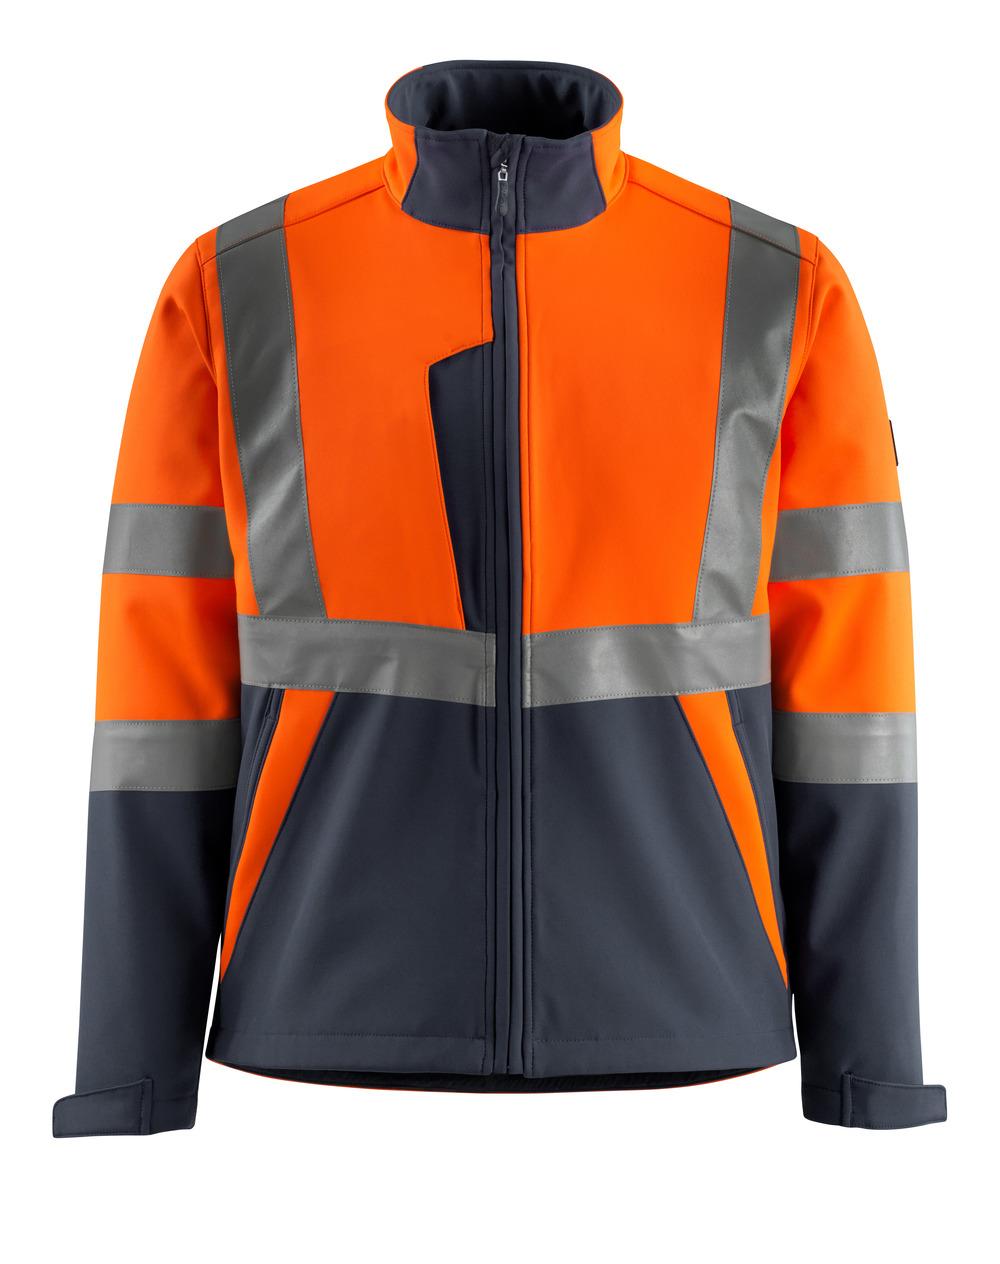 15902-253-14010 Giacca Softshell - arancio hi-vis/blu navy scuro